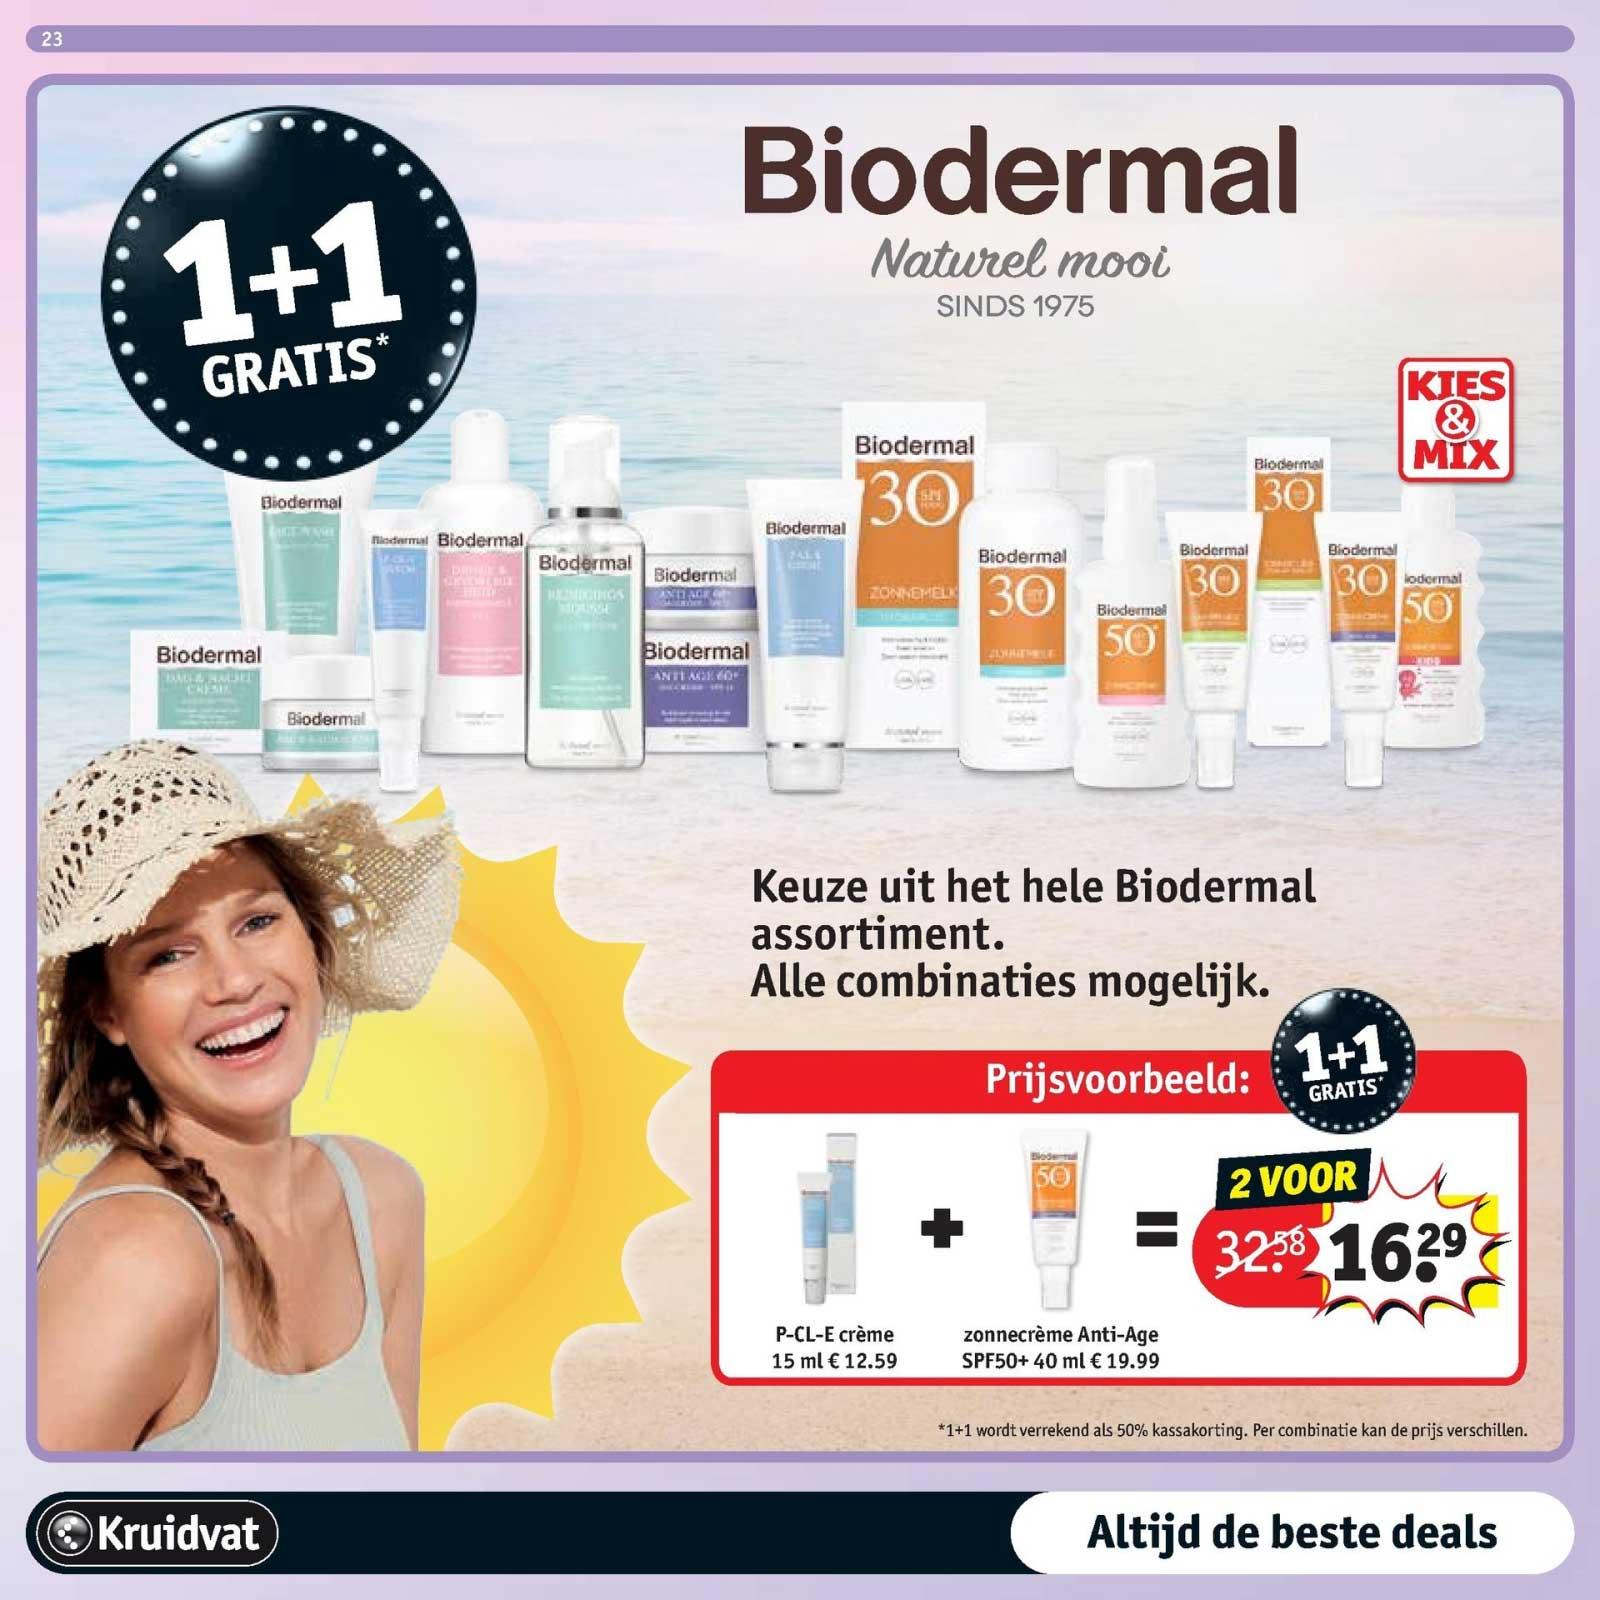 Kruidvat Biodermal: 1+1 Gratis